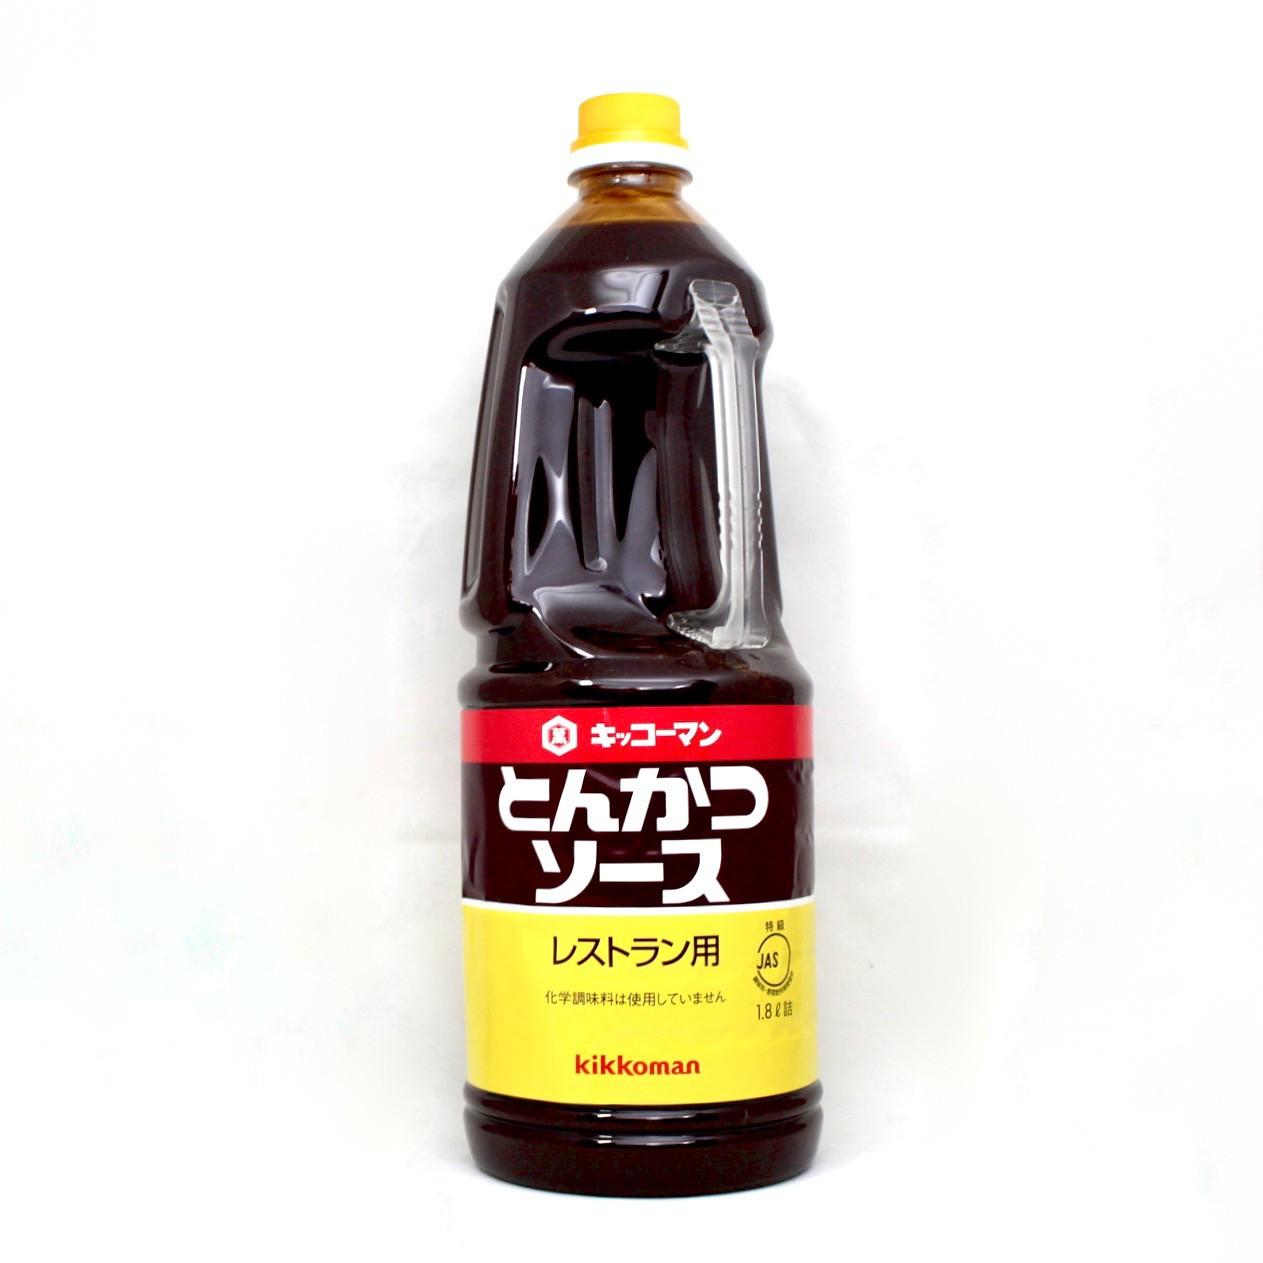 KIKKOMAN TONKATSU SAUCE 1.8 L